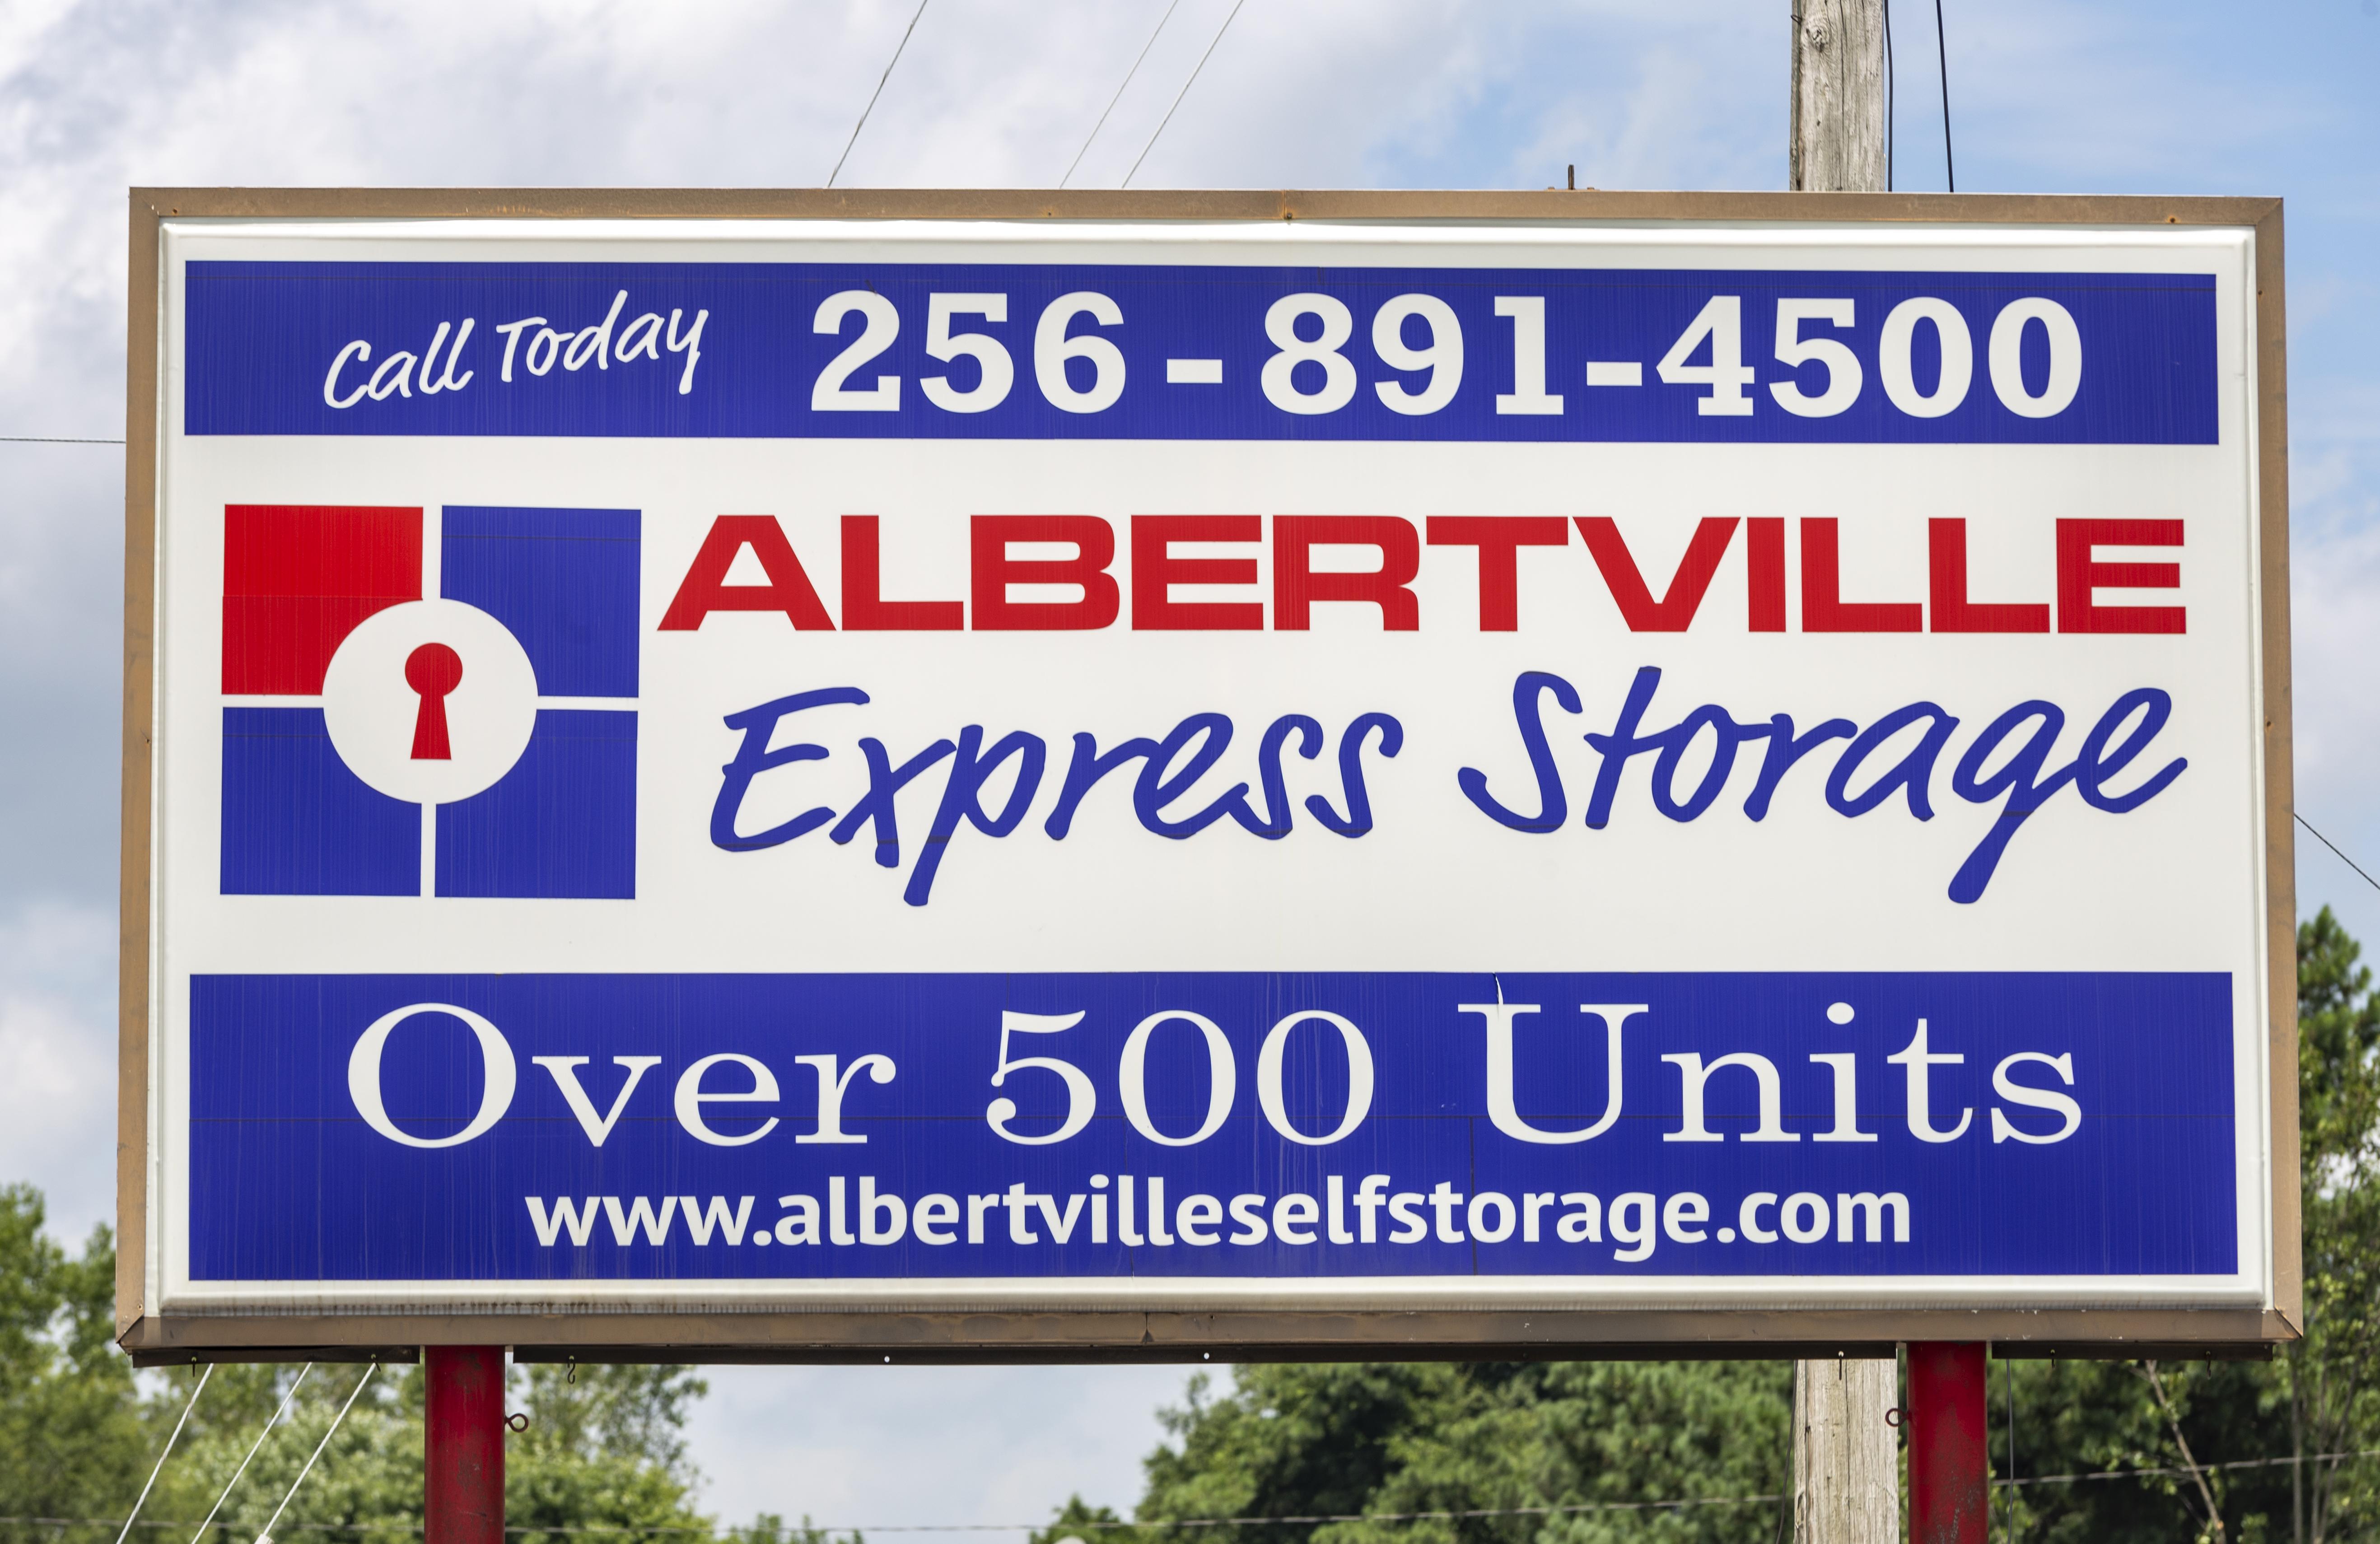 Albertville Express Storage Office in Albertville, AL